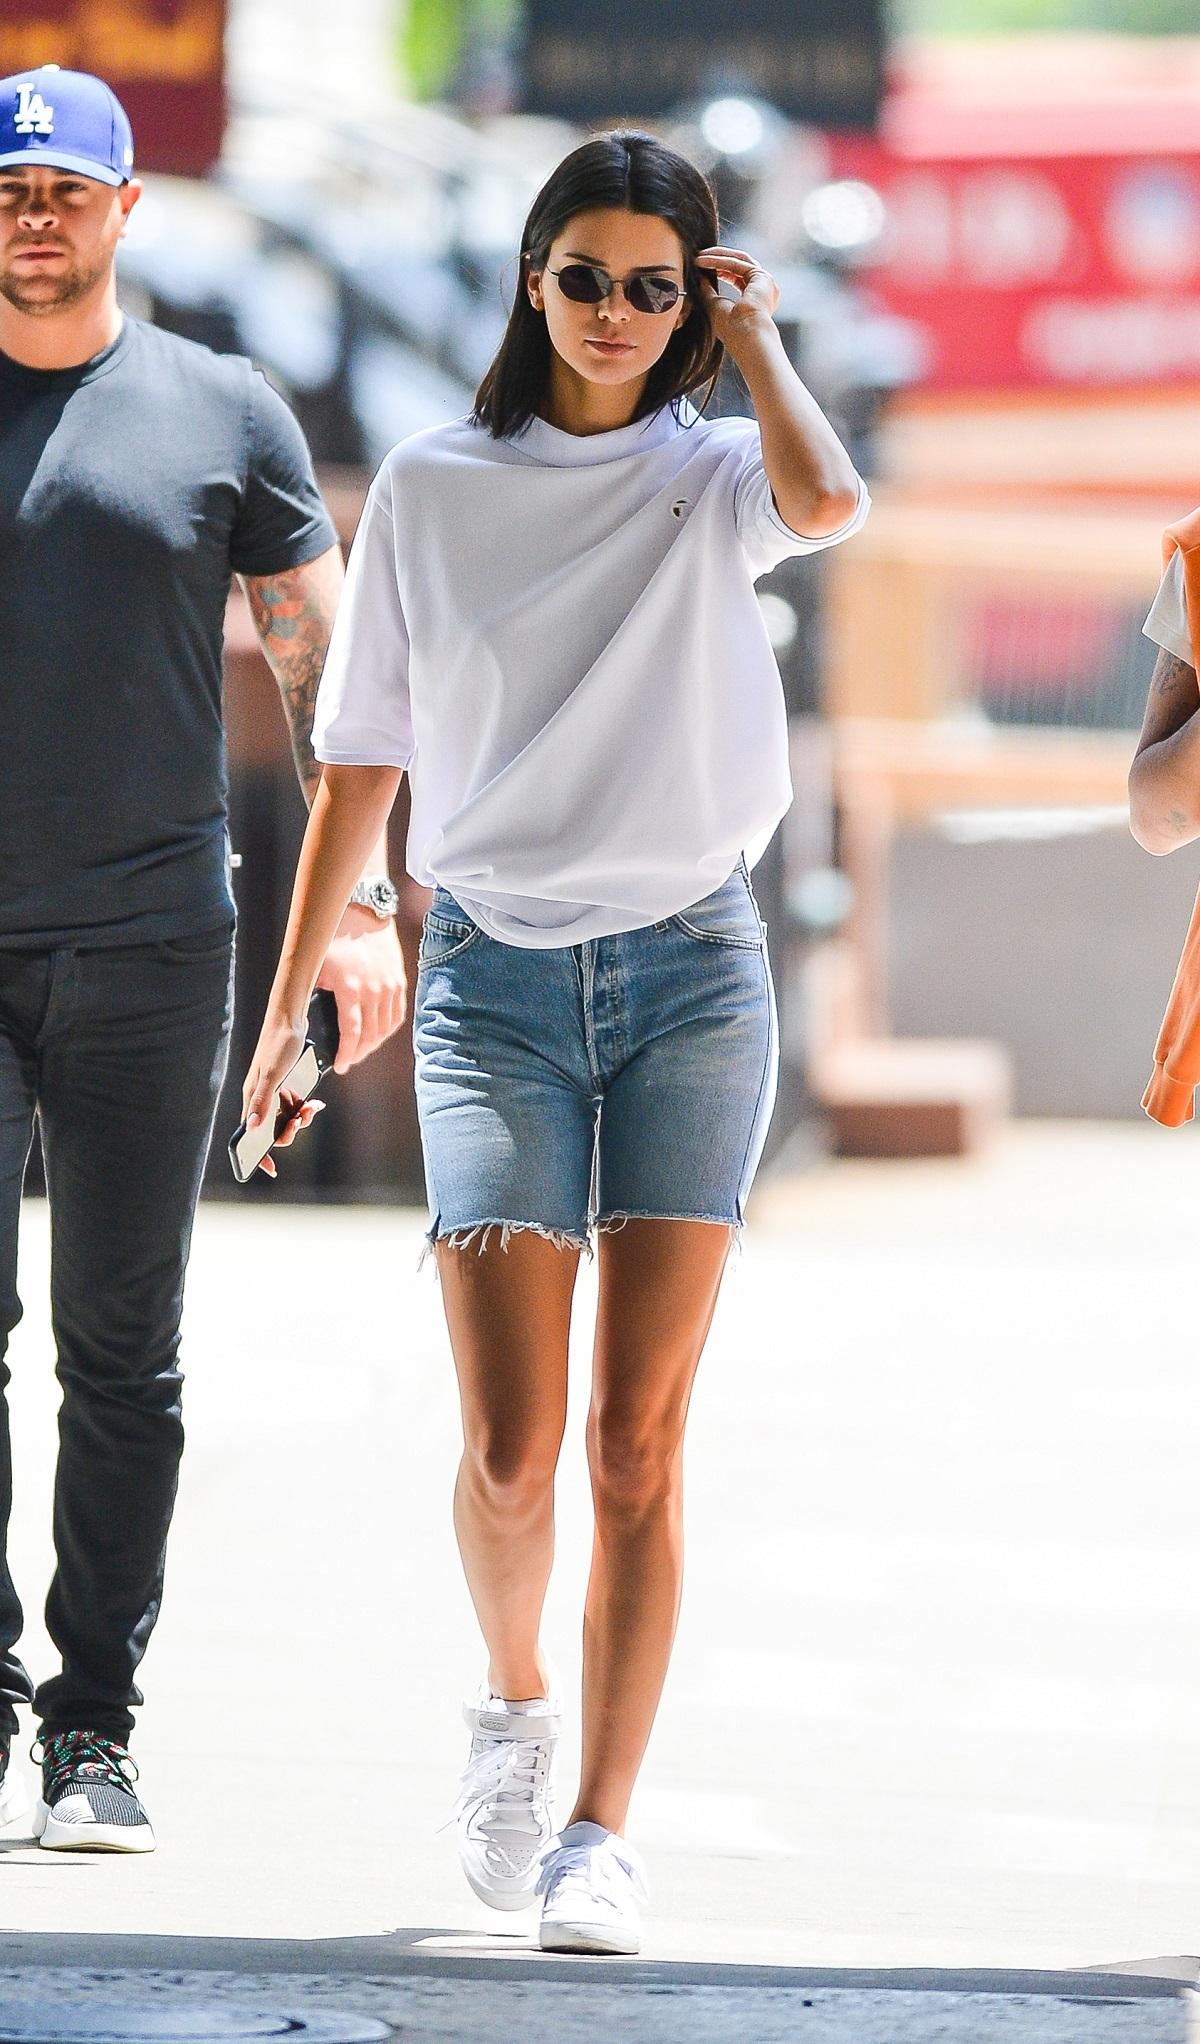 Kendall Jenner con shorts y camiseta.